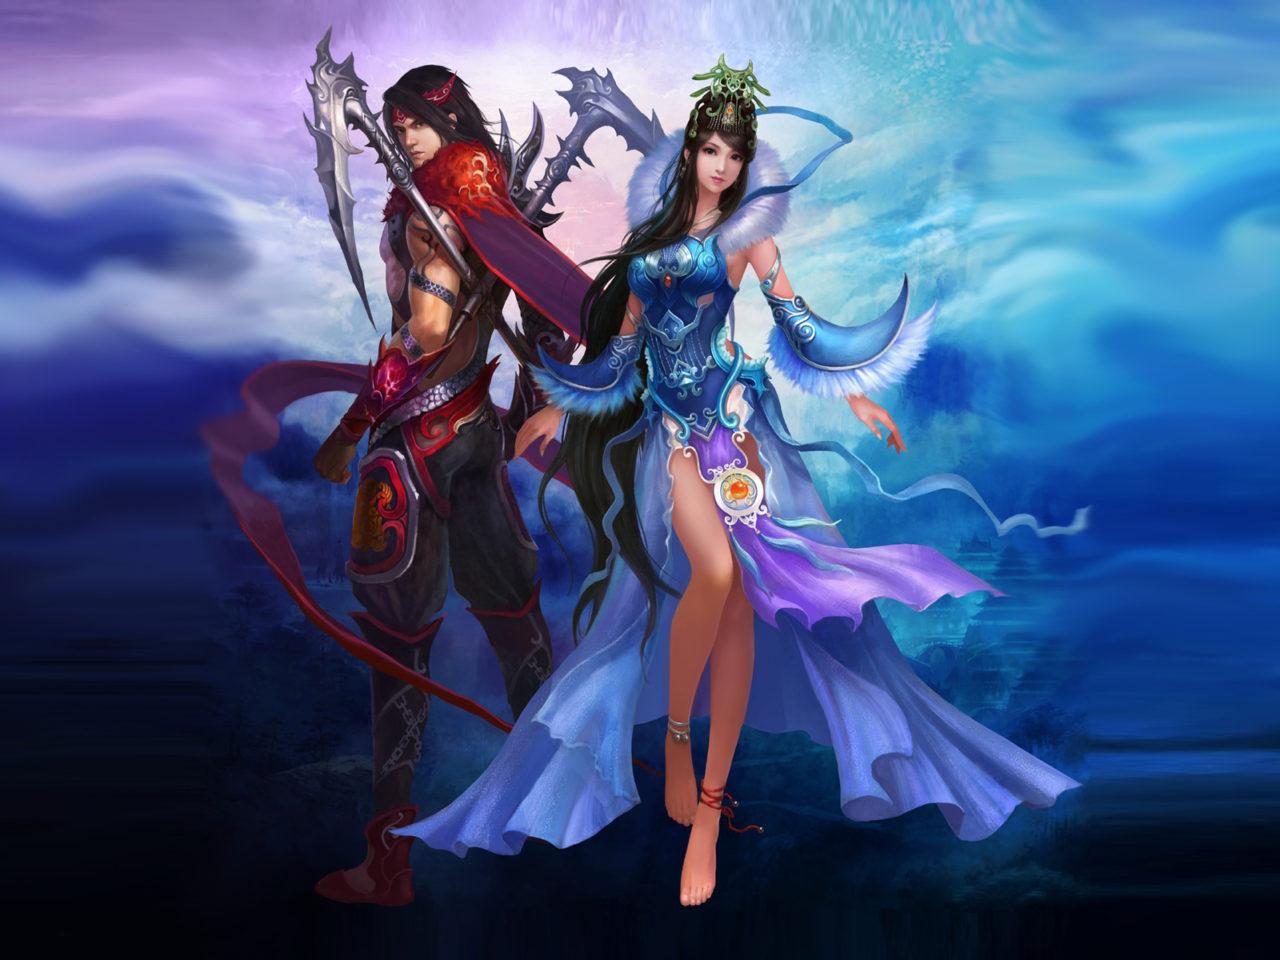 3d Action Wallpaper Hd Jade Dynasty Video Game Desktop Wallpaper Hd Resolution